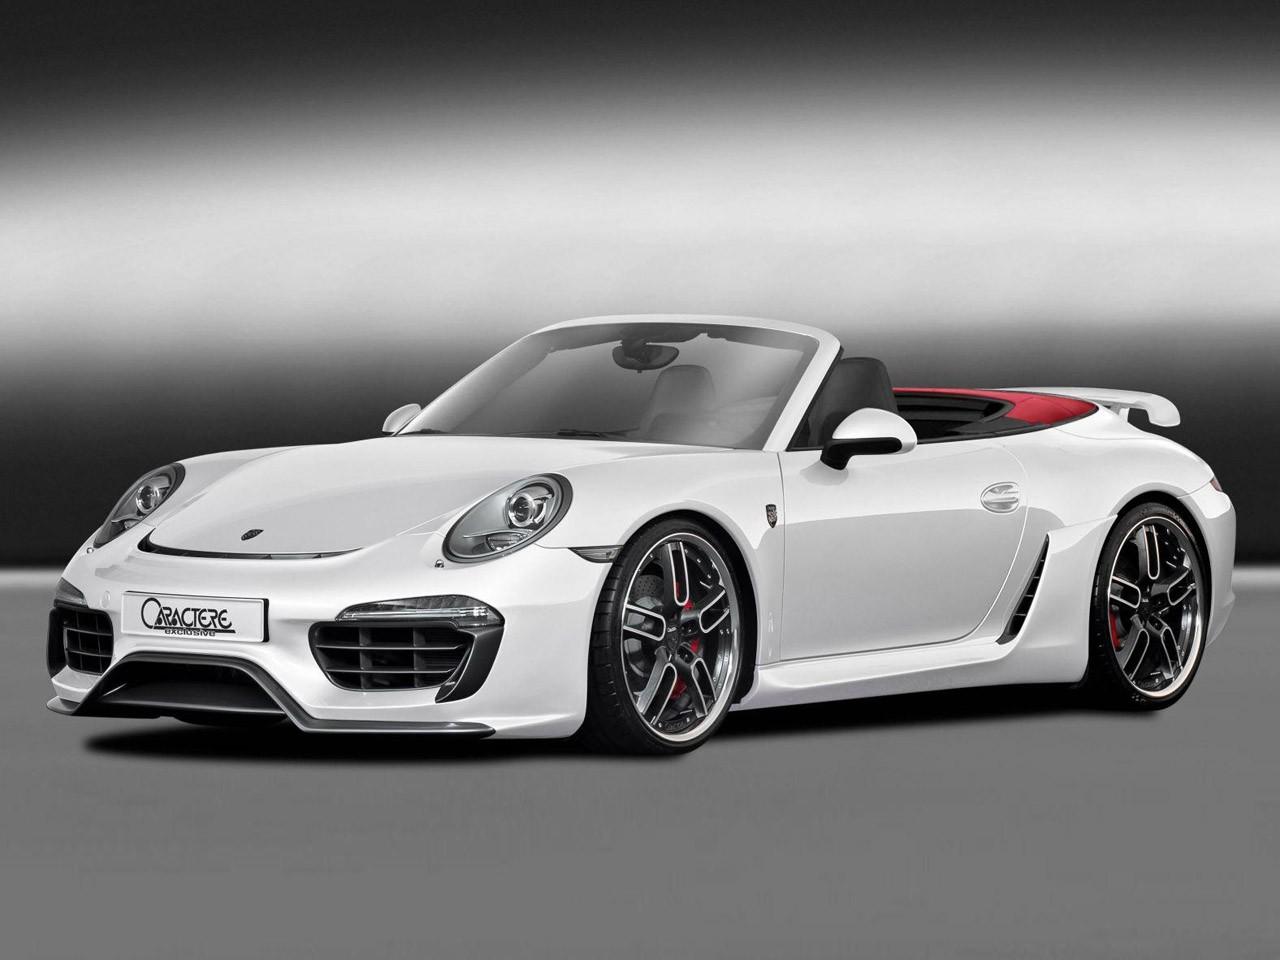 Caractere Porsche 911 Cabriolet 2013